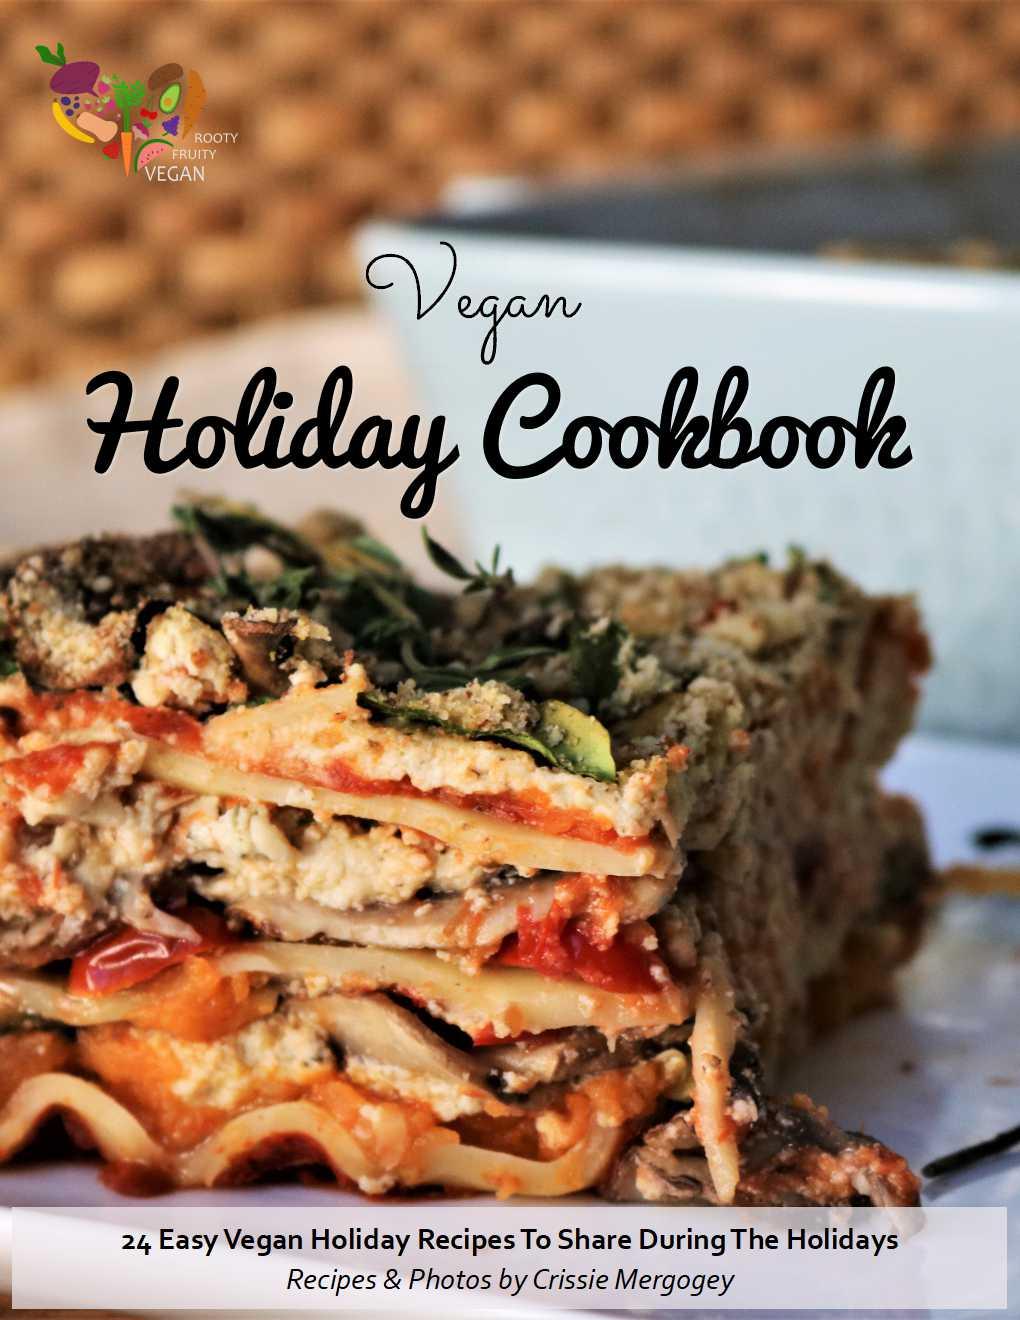 Rooty Fruity Vegan's Holiday Cookbook